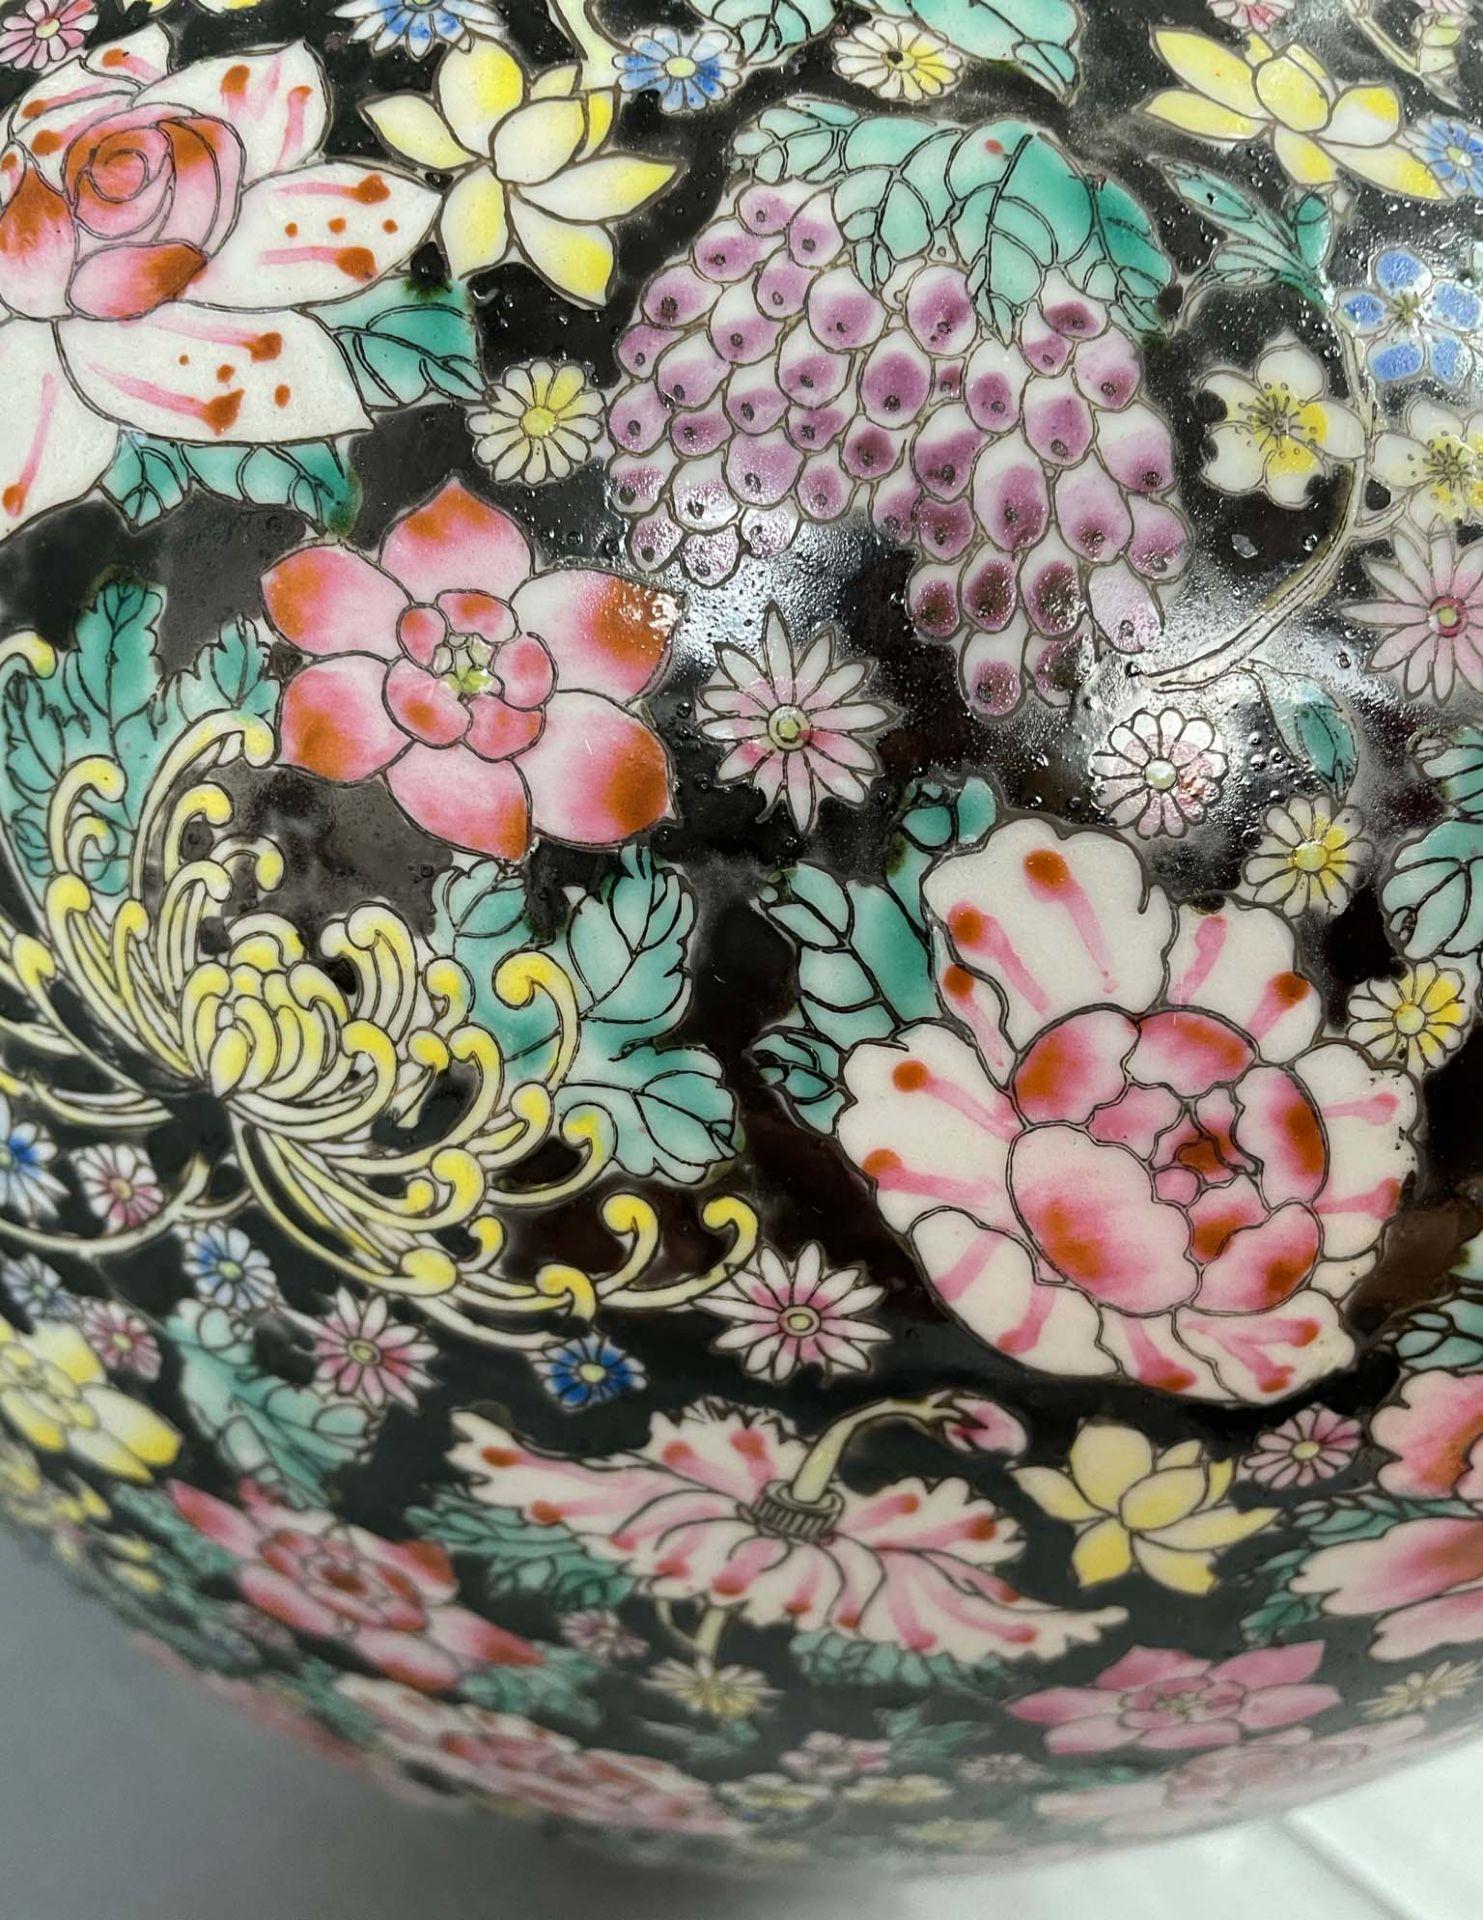 China. Porzellan. Vase. Stempelmarke circa 1930 - 1950. 53 cm hoch. - Image 12 of 20